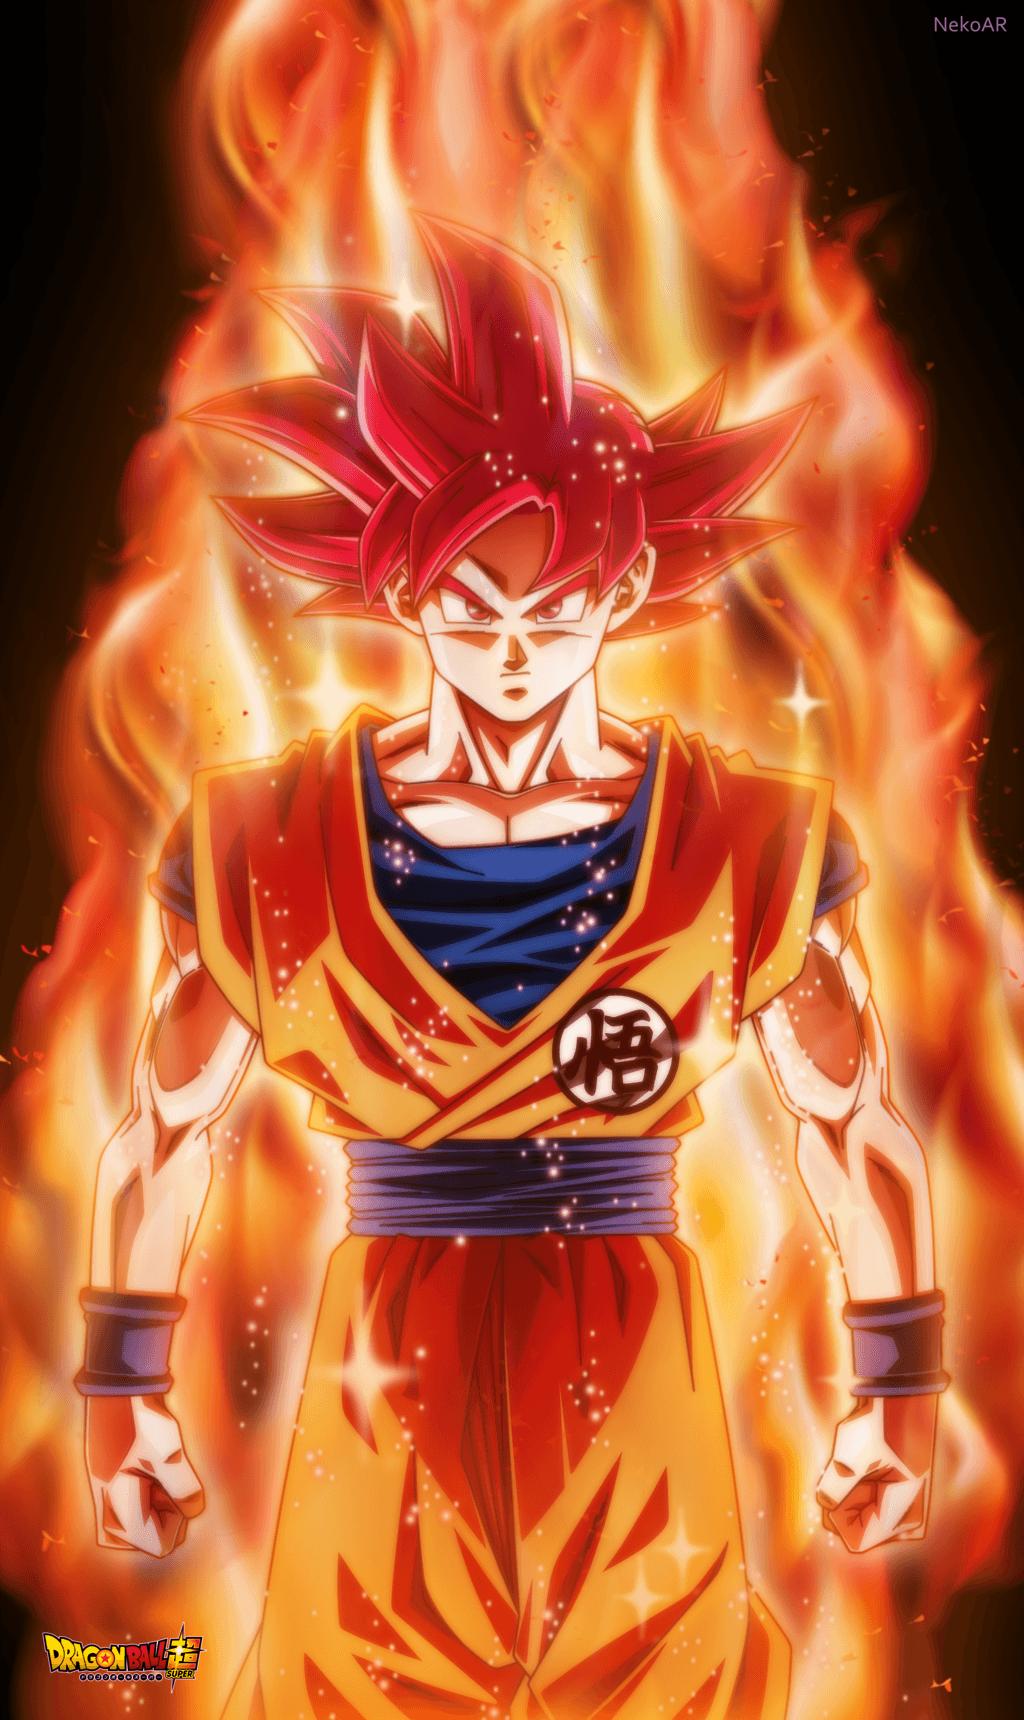 1024x1720 Super Saiyan God Poster By Nekoar On Deviantart Anime Dragon Ball Super Dragon Ball Goku Dragon Ball Super Goku